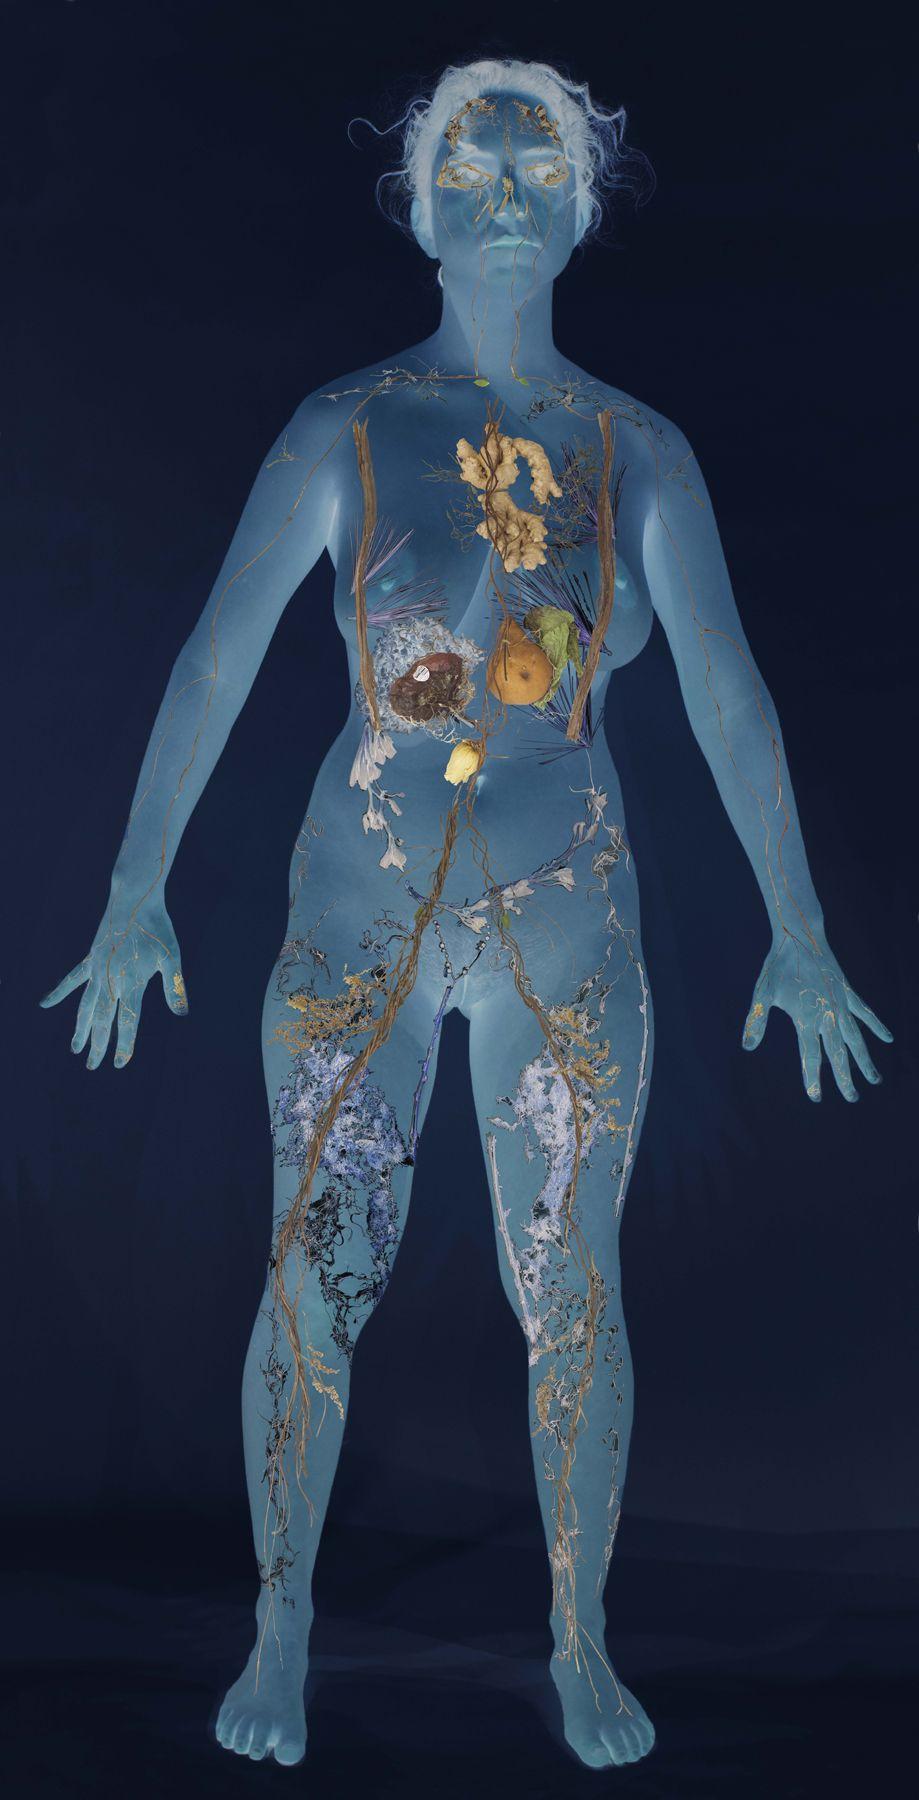 Naomi Zahler, Full Body Scan, 2018, BARD x HGG, Howard Greenberg Gallery, 2019